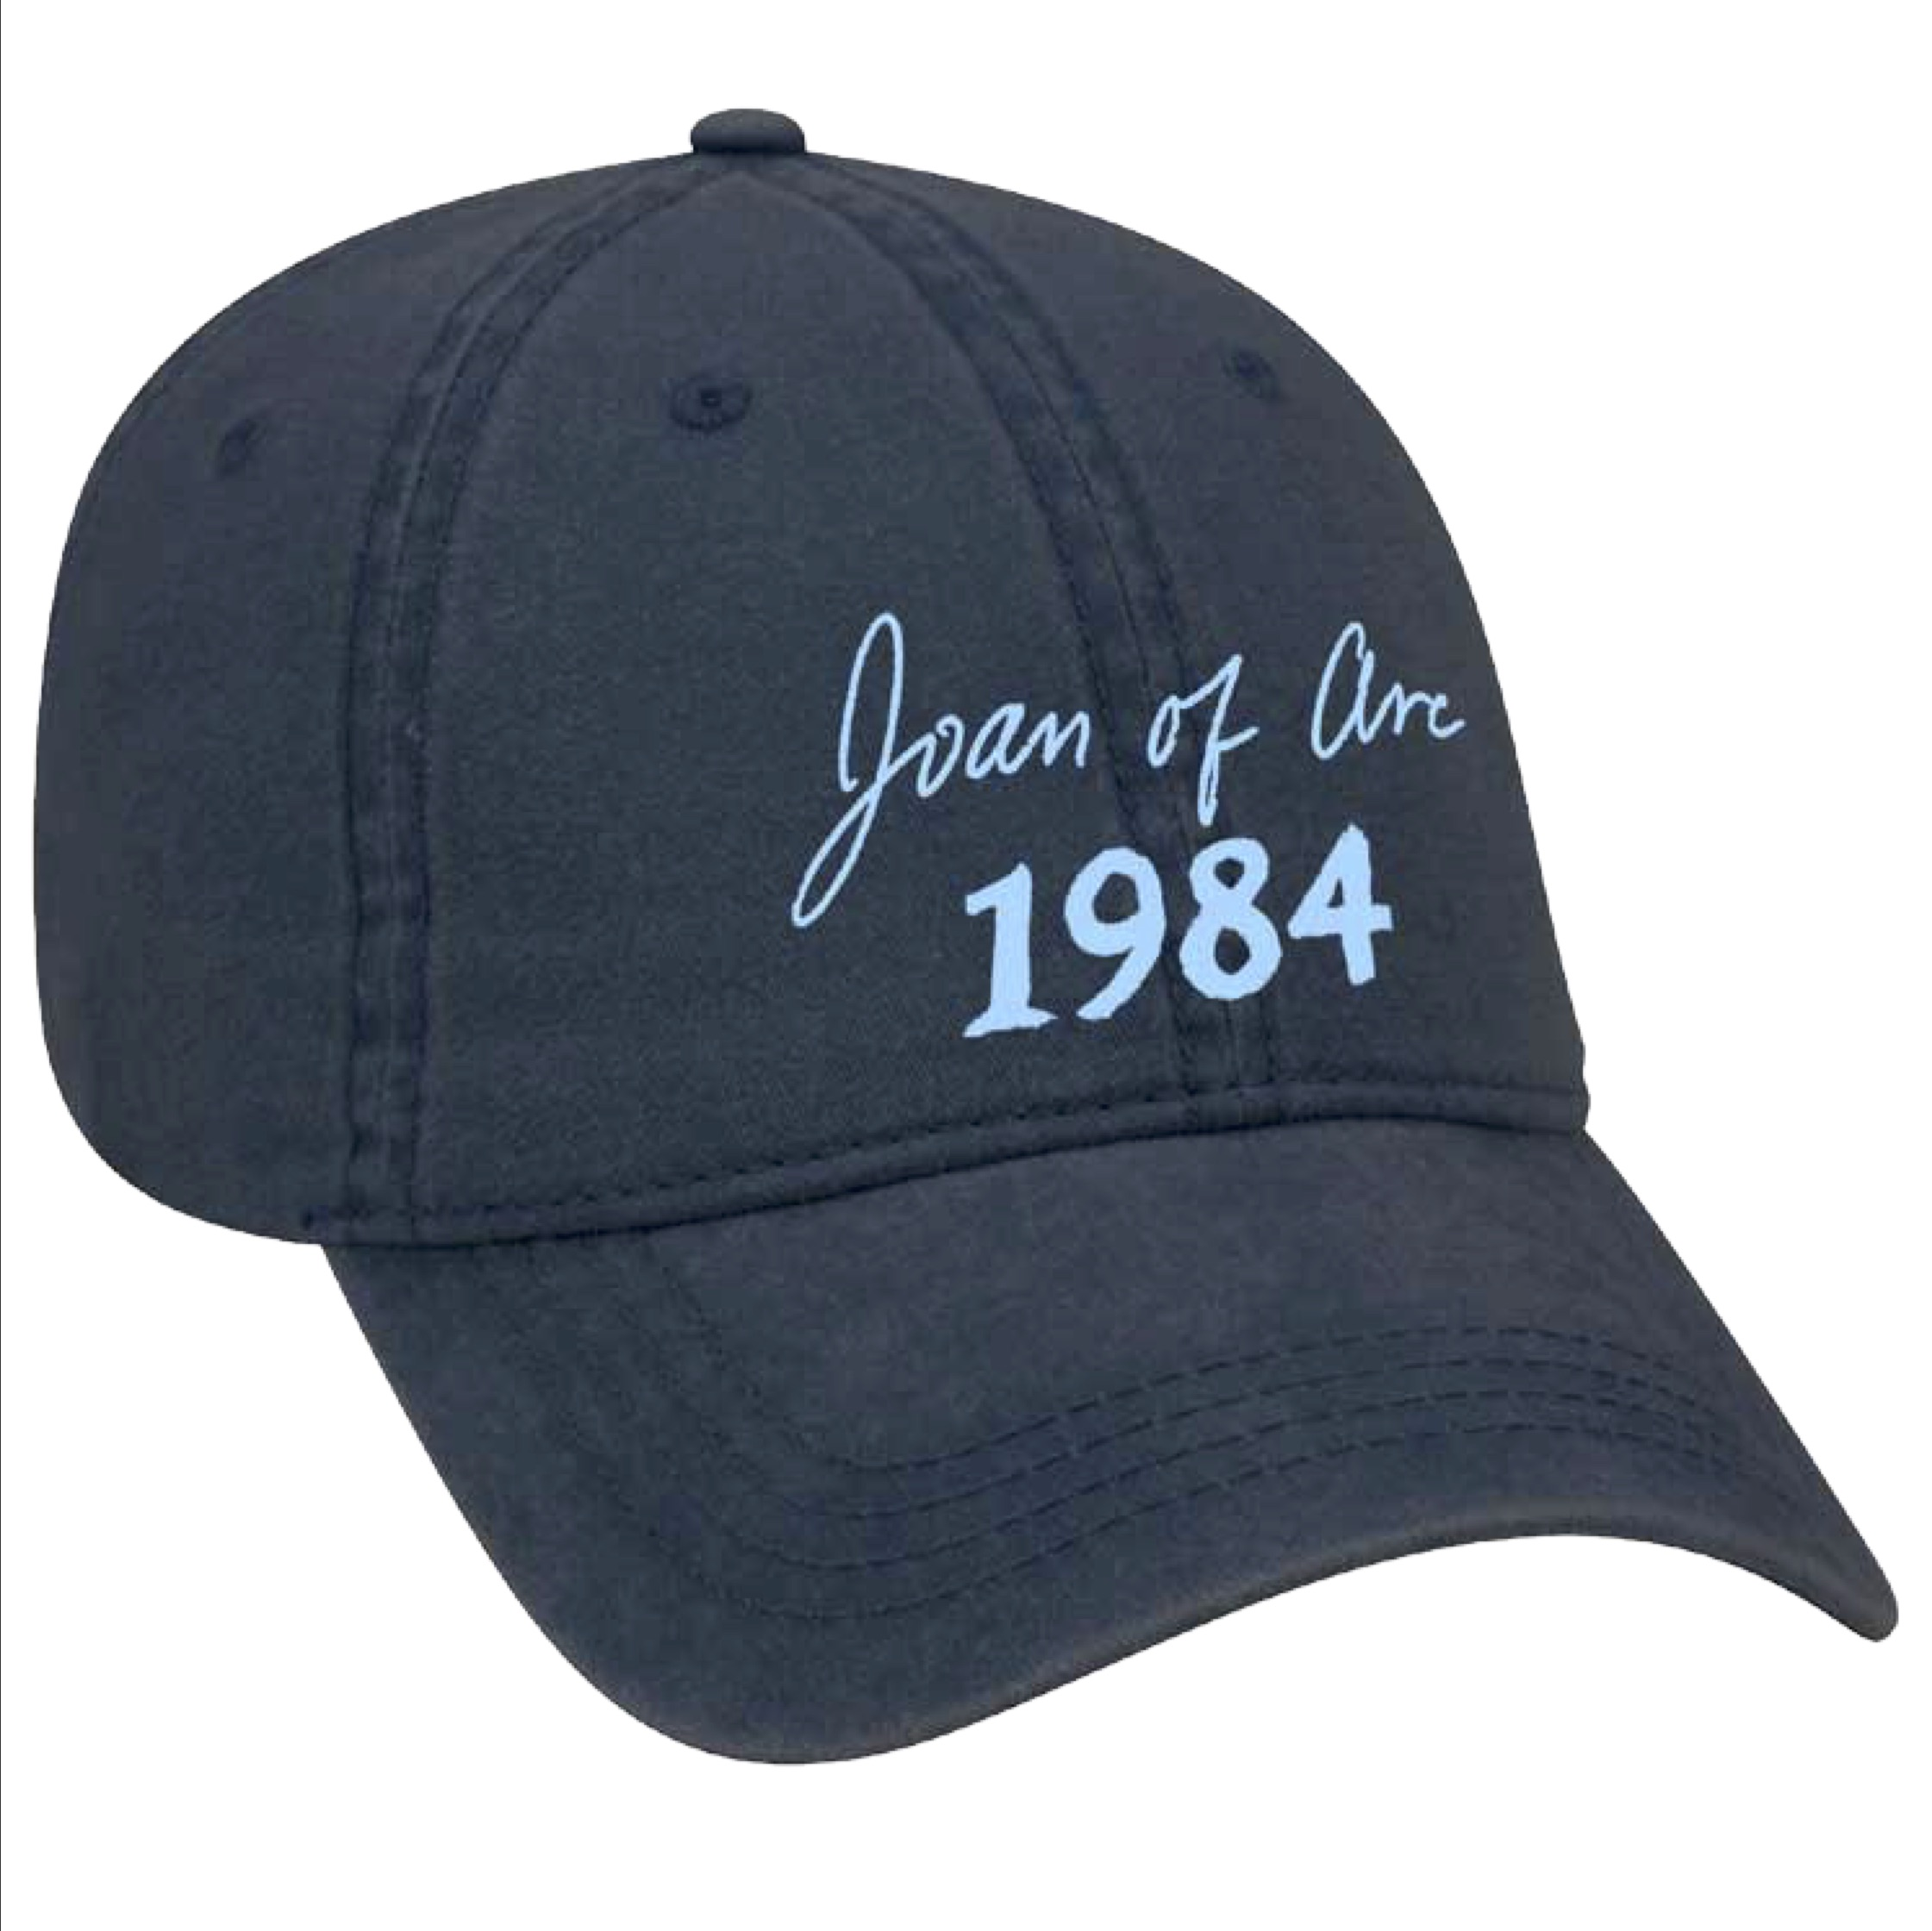 JoanOfArc-1984hat copy.jpg